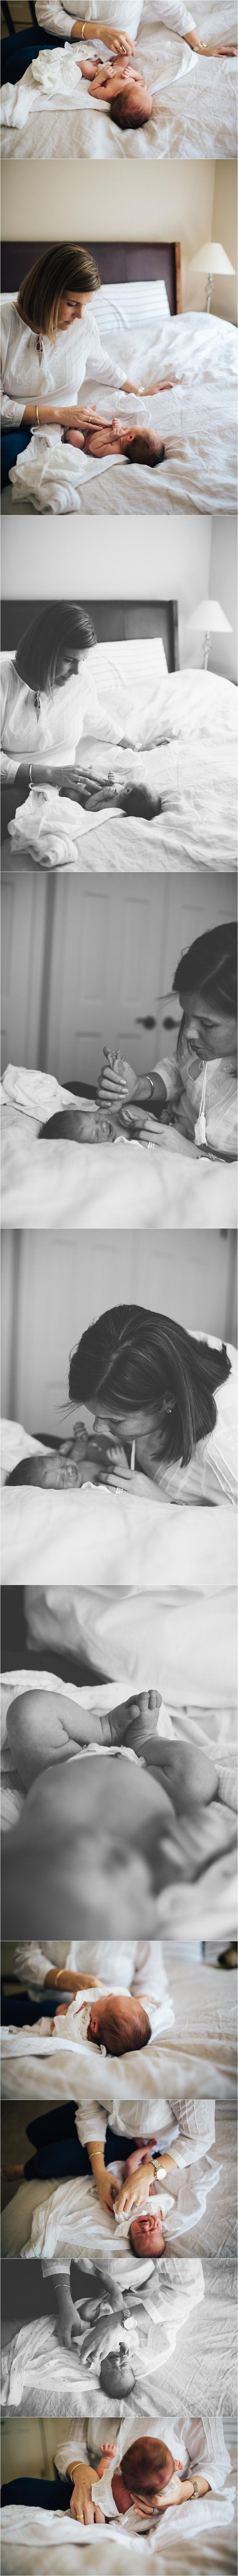 newbornphotographerkansascity_0010